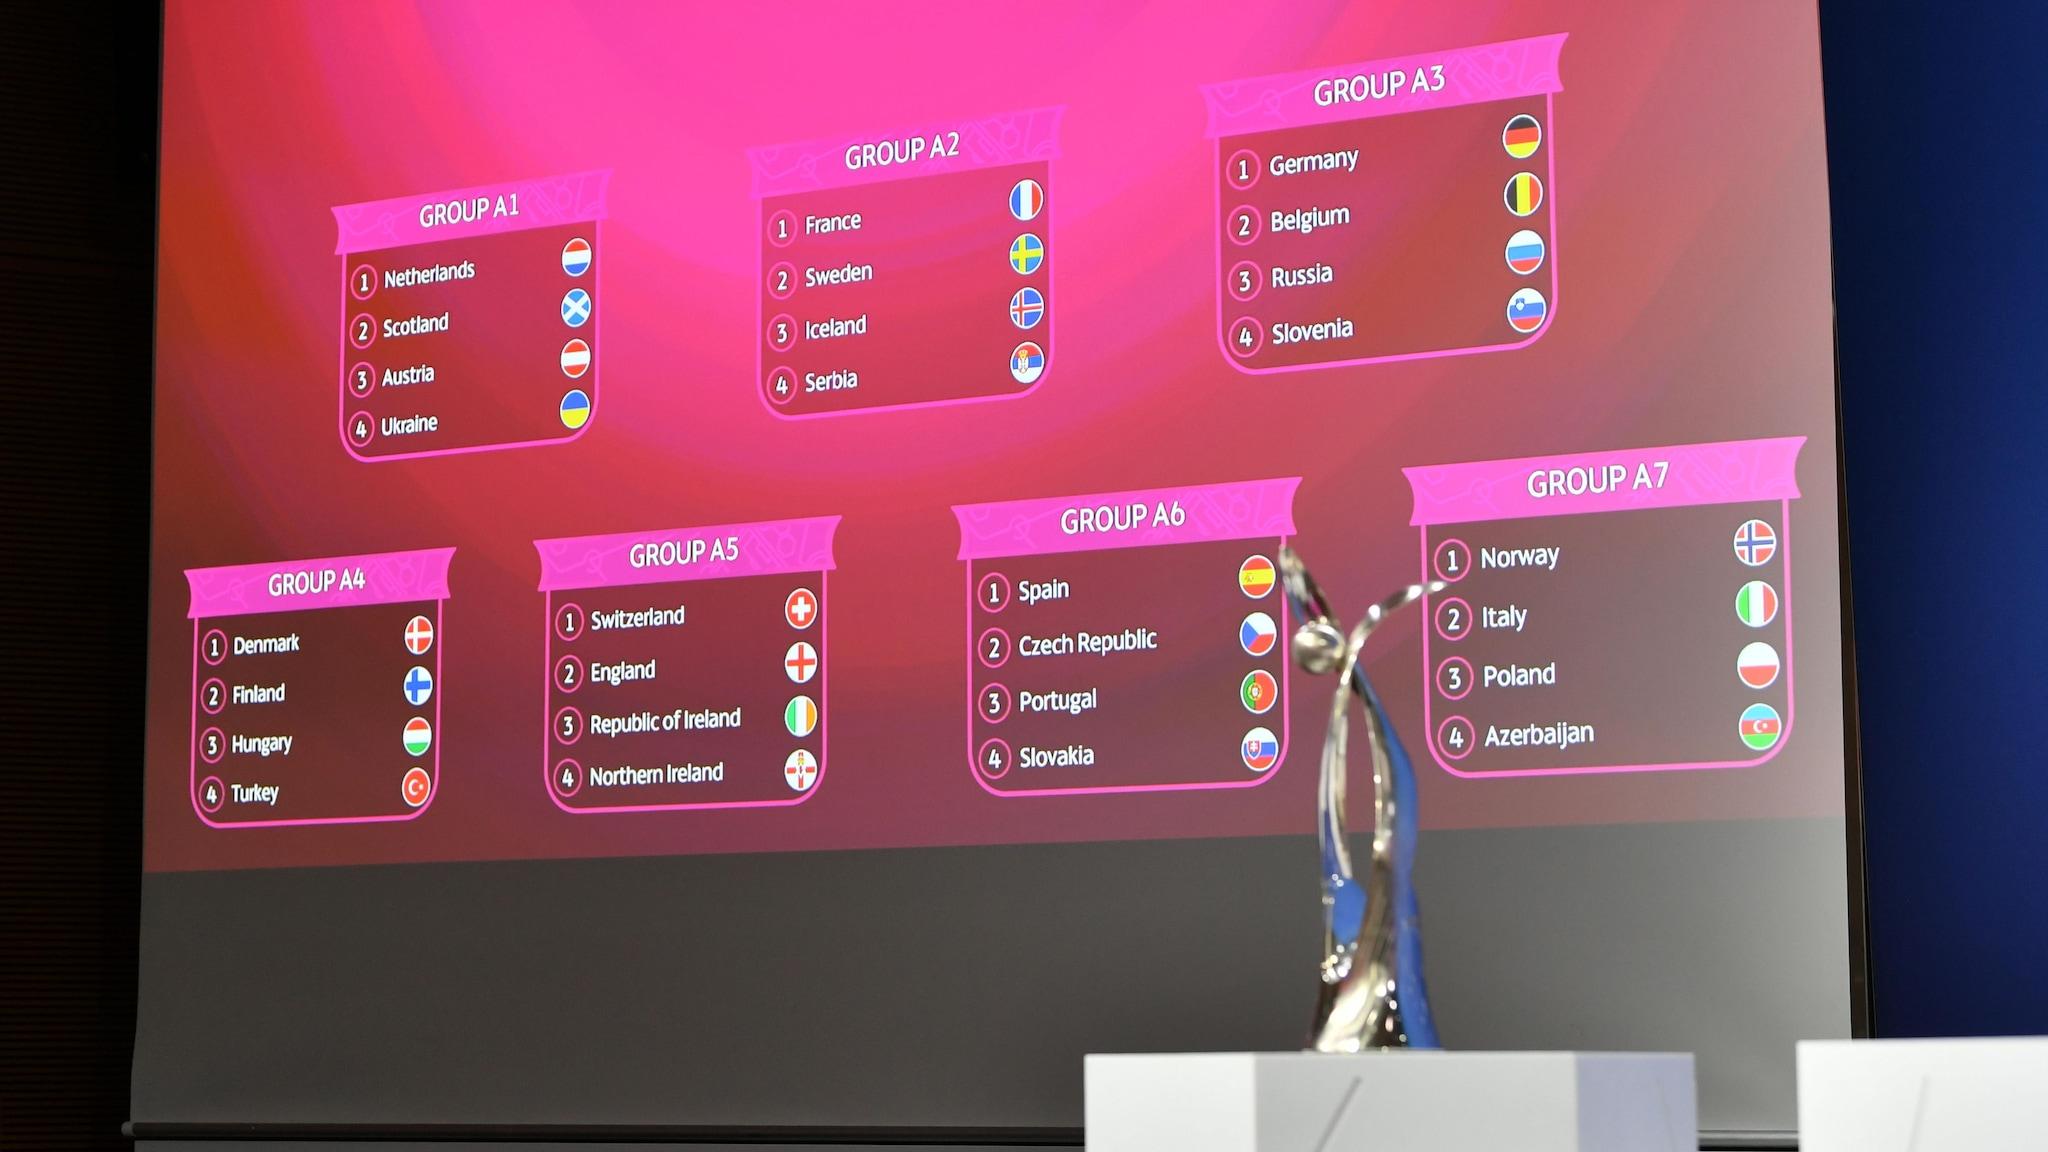 2021/22 Women's U19 round 1 guide